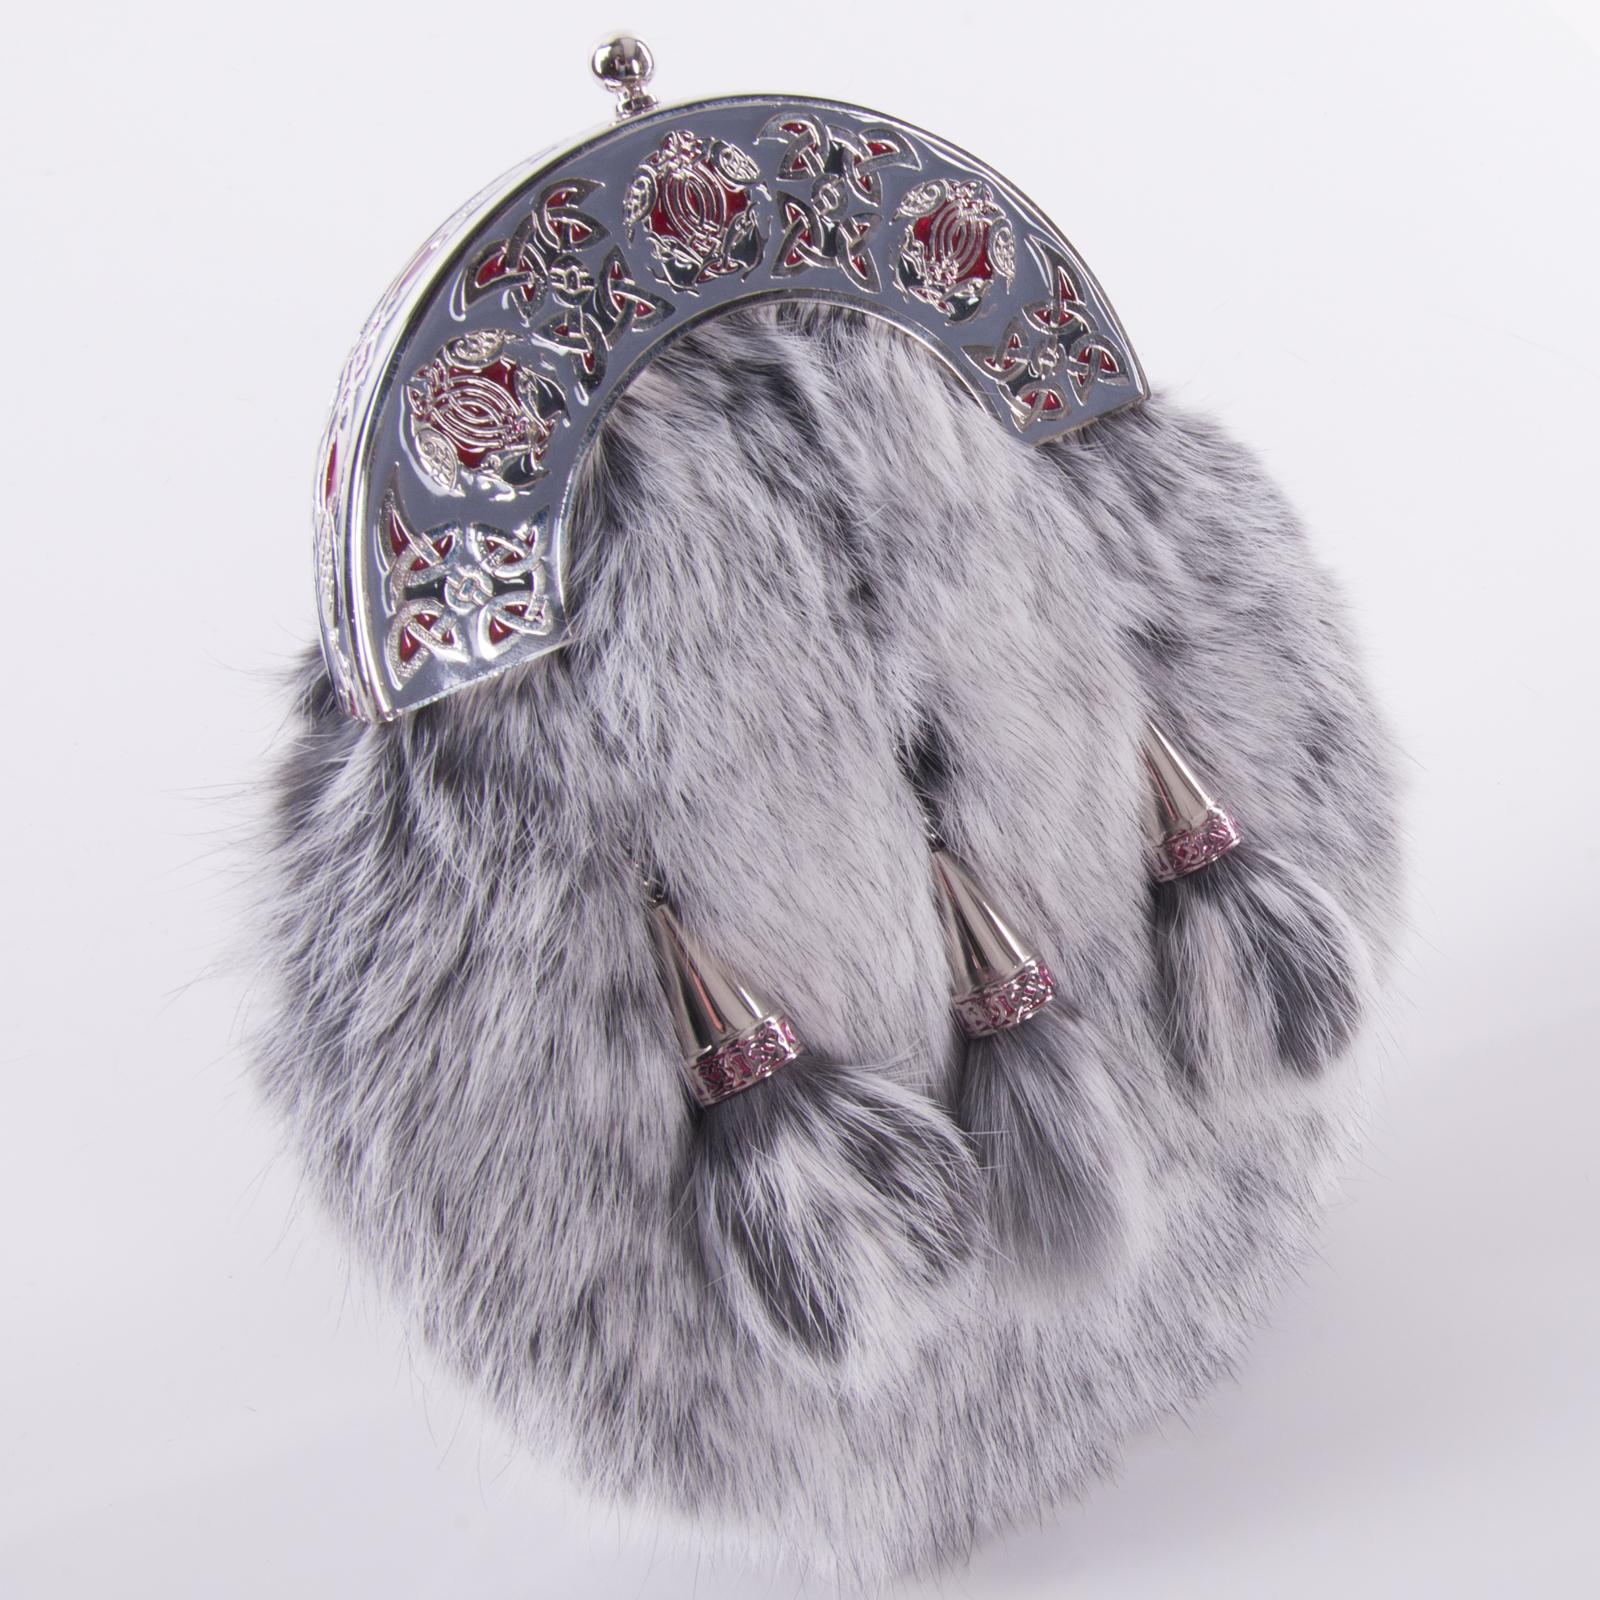 Rabbit Fur 3 Tassel Dress Kilt Sporran Black Enamel with Chain Strap-Fur Sporran